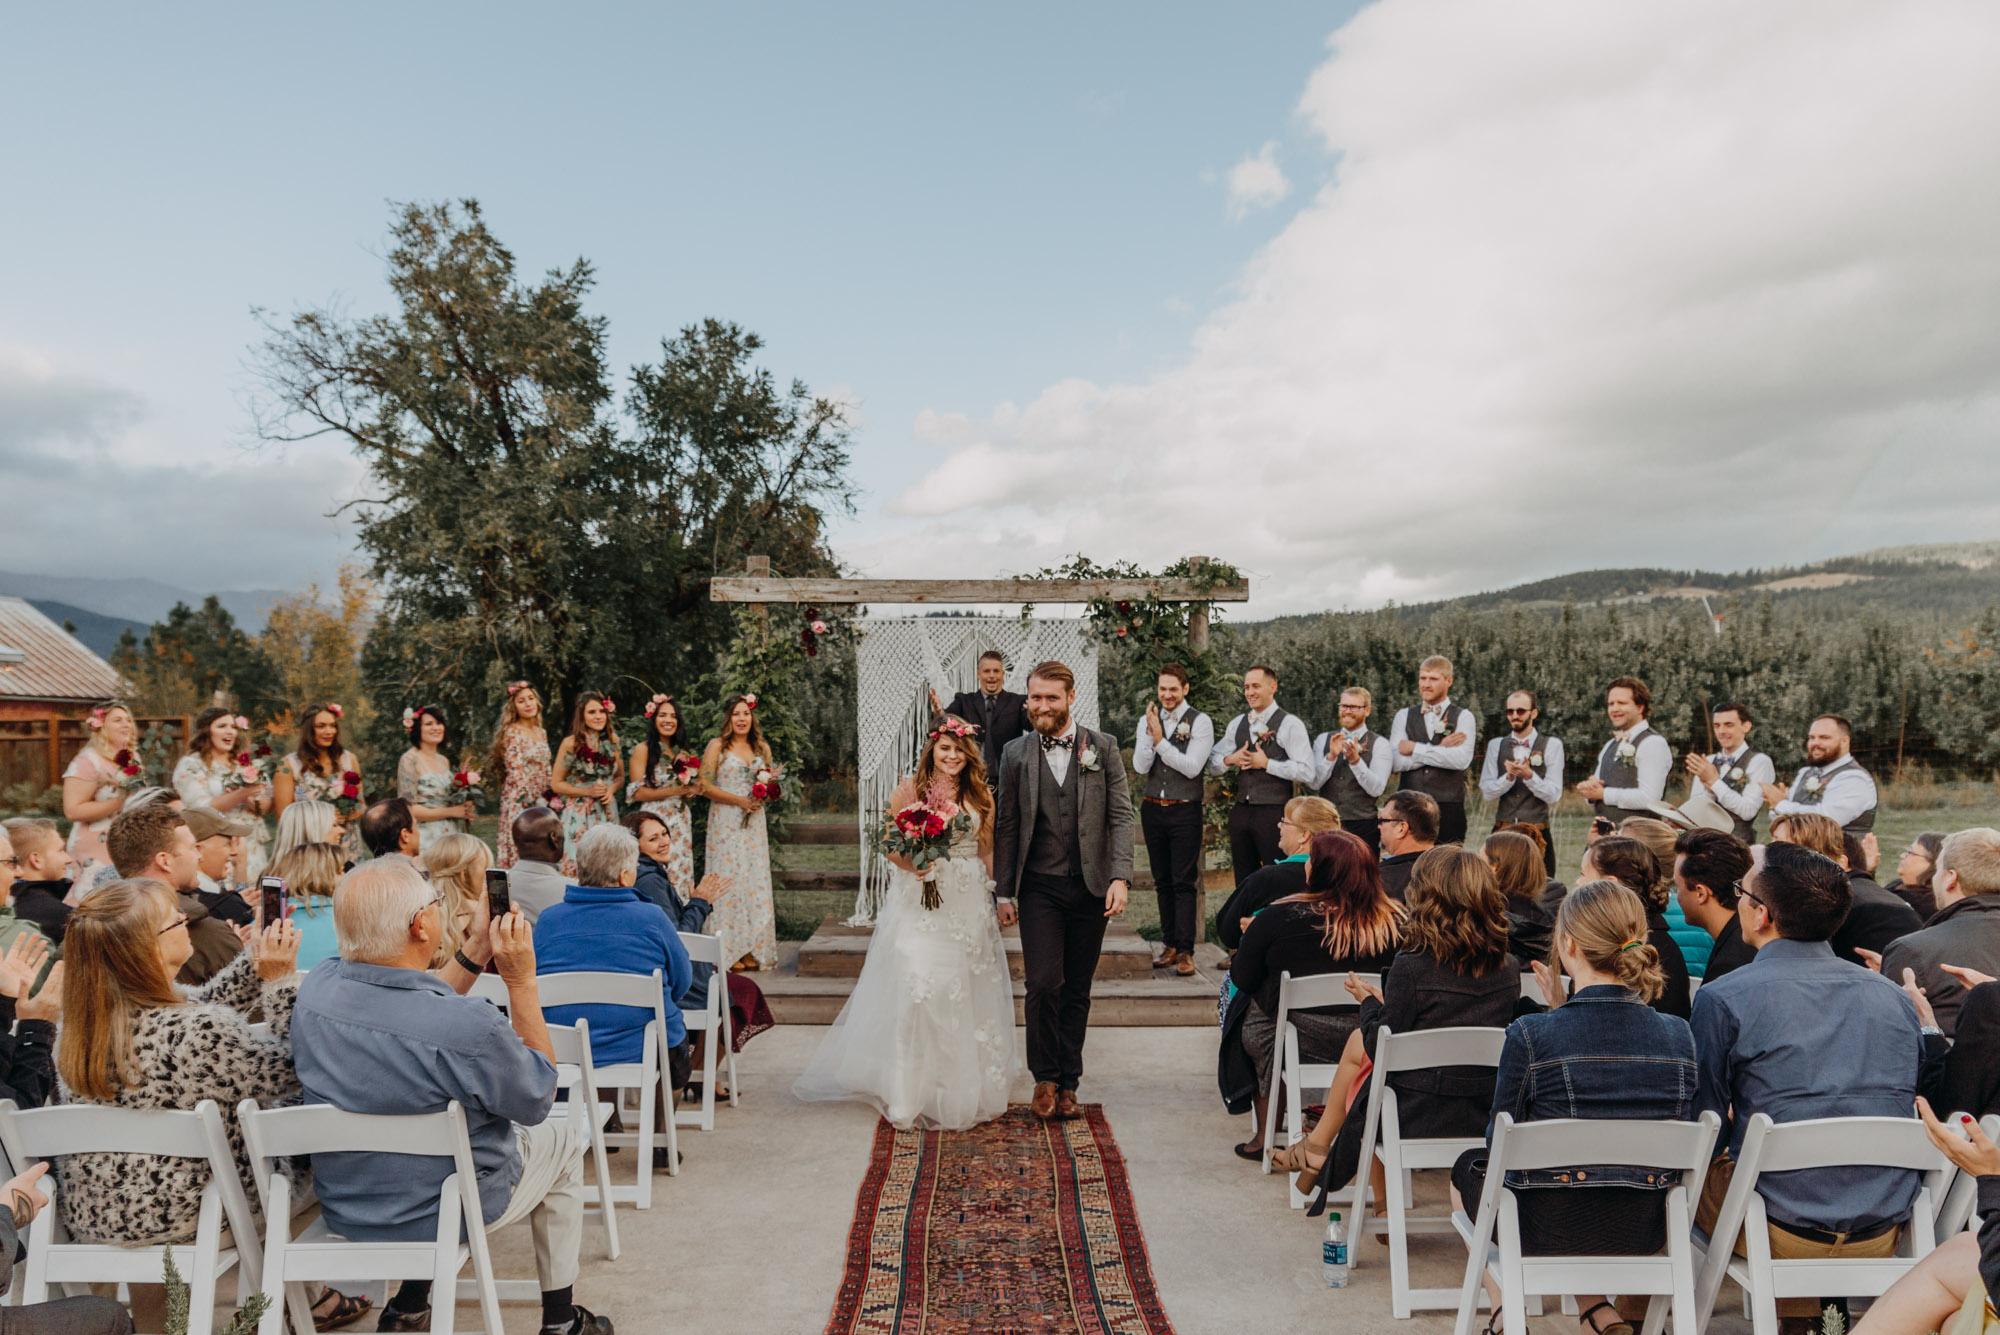 Outdoor-Summer-Ceremony-Washington-Wedding-Rainbow-5434.jpg